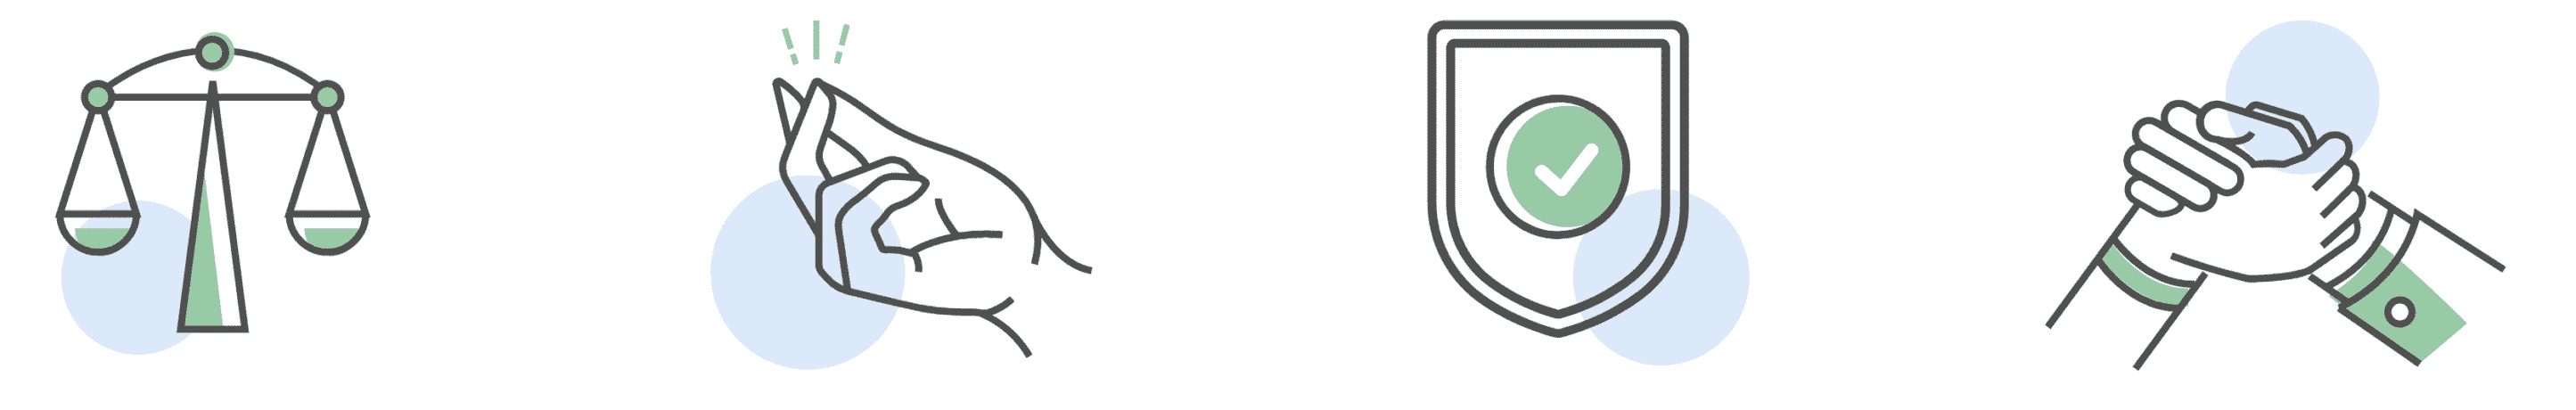 FI symbols2